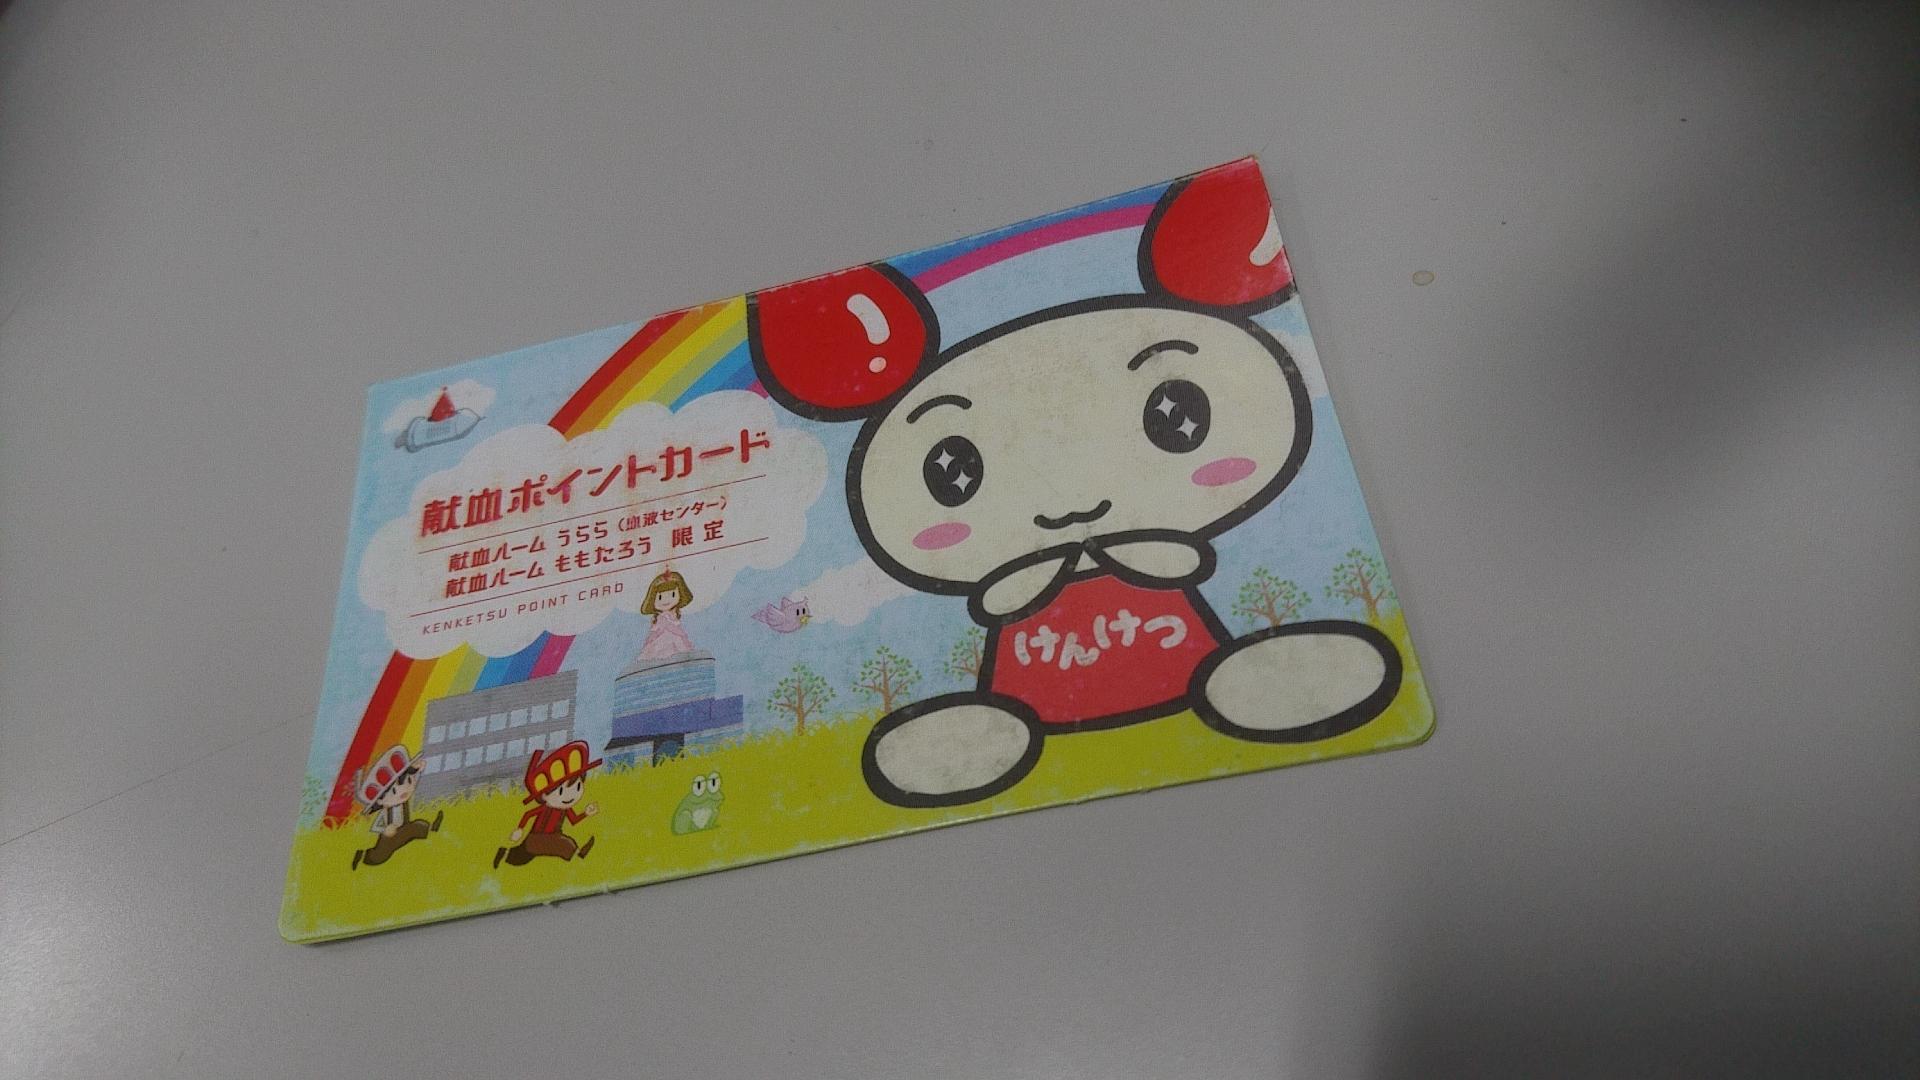 kenketsu_point.jpg